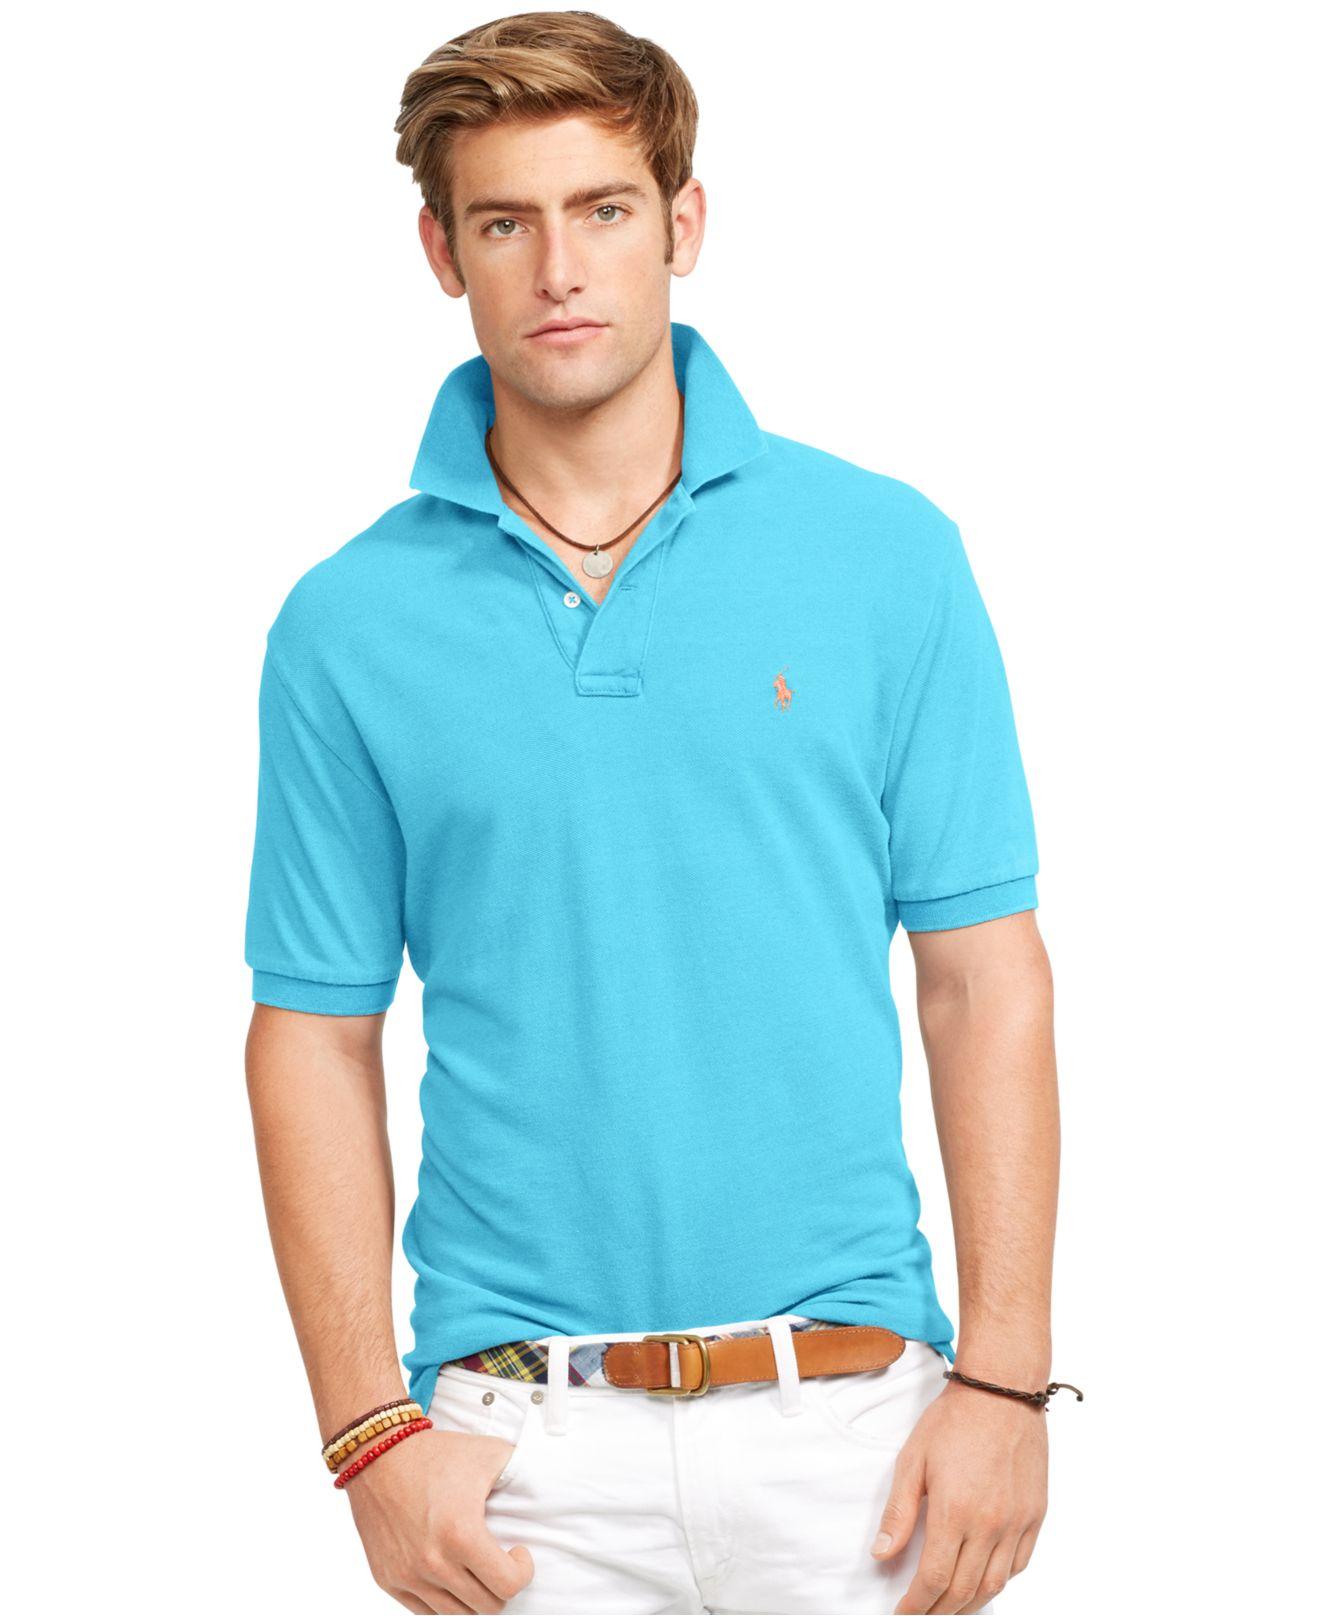 Lyst - Polo Ralph Lauren Classic-fit Mesh Polo Shirt in Blue for Men 32795398c8cc